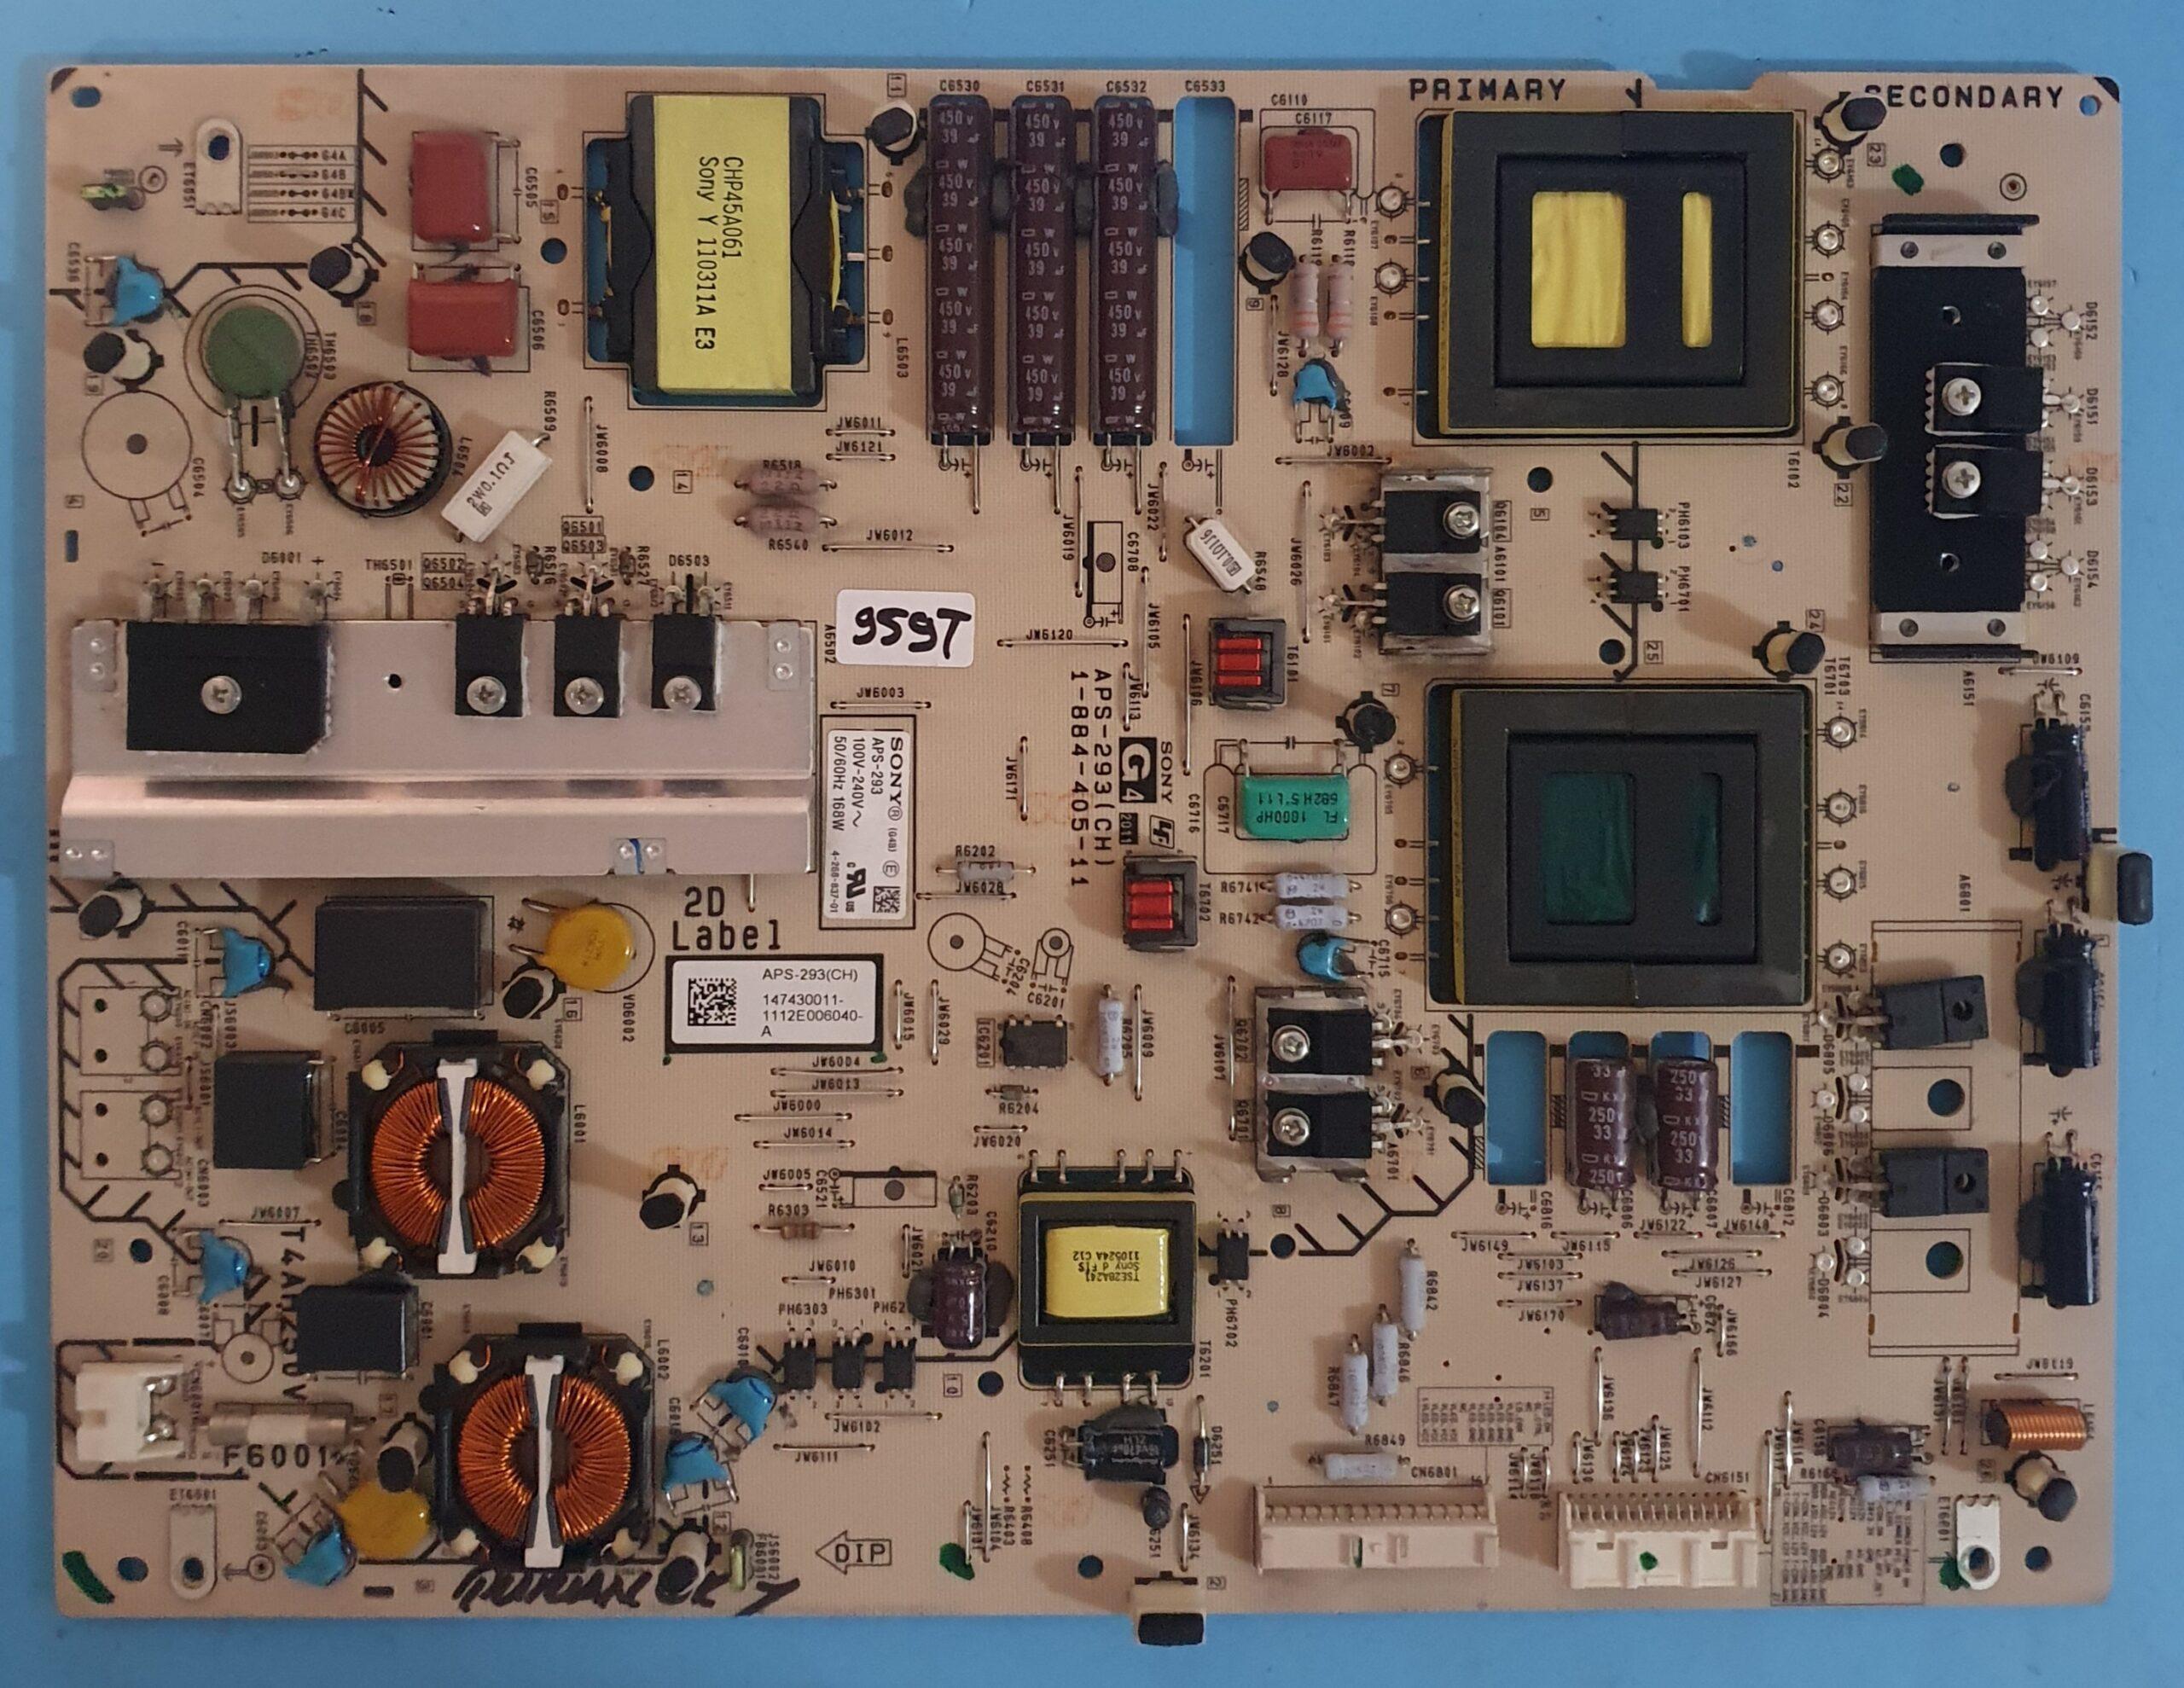 1-884-405-11,APS-293 SONY Power (KDV DAHİL = 295 TL)